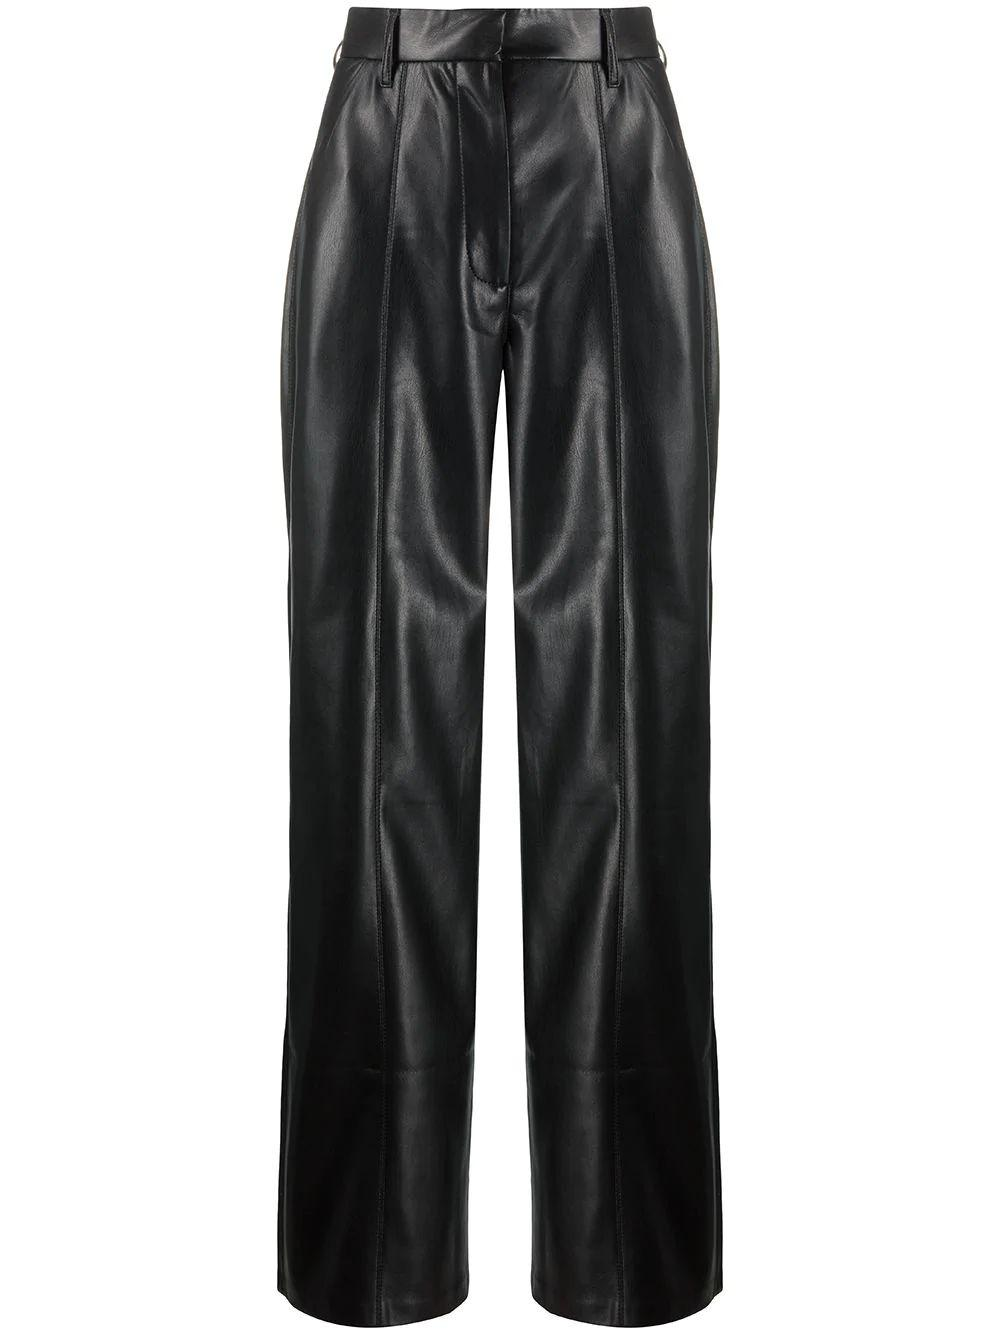 Cleo Vegan Leather Straight Leg Pant